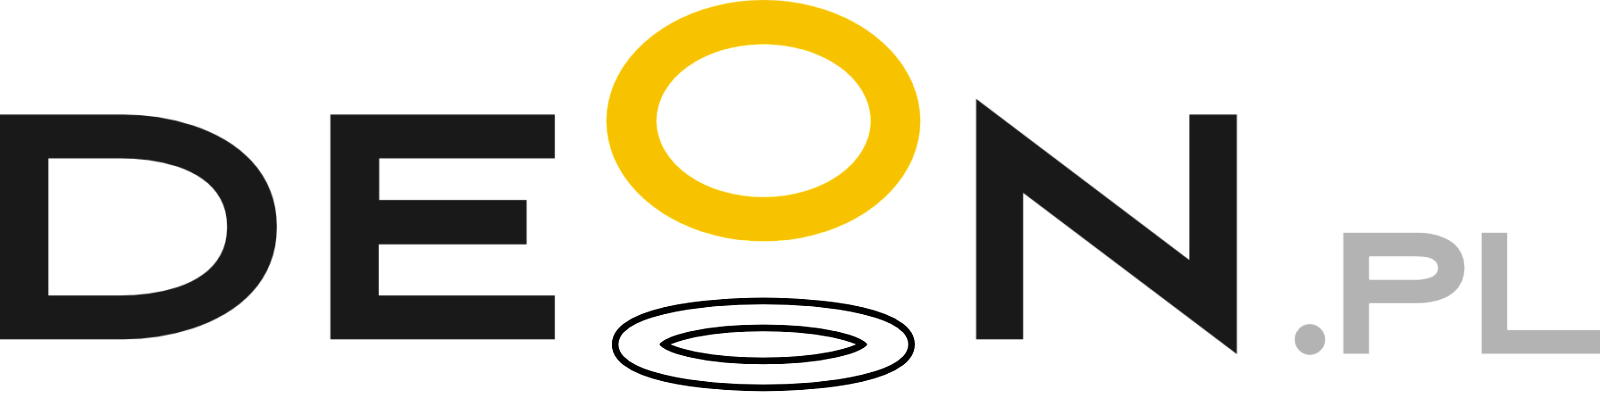 deon.pl-proste.png [37.66 KB]